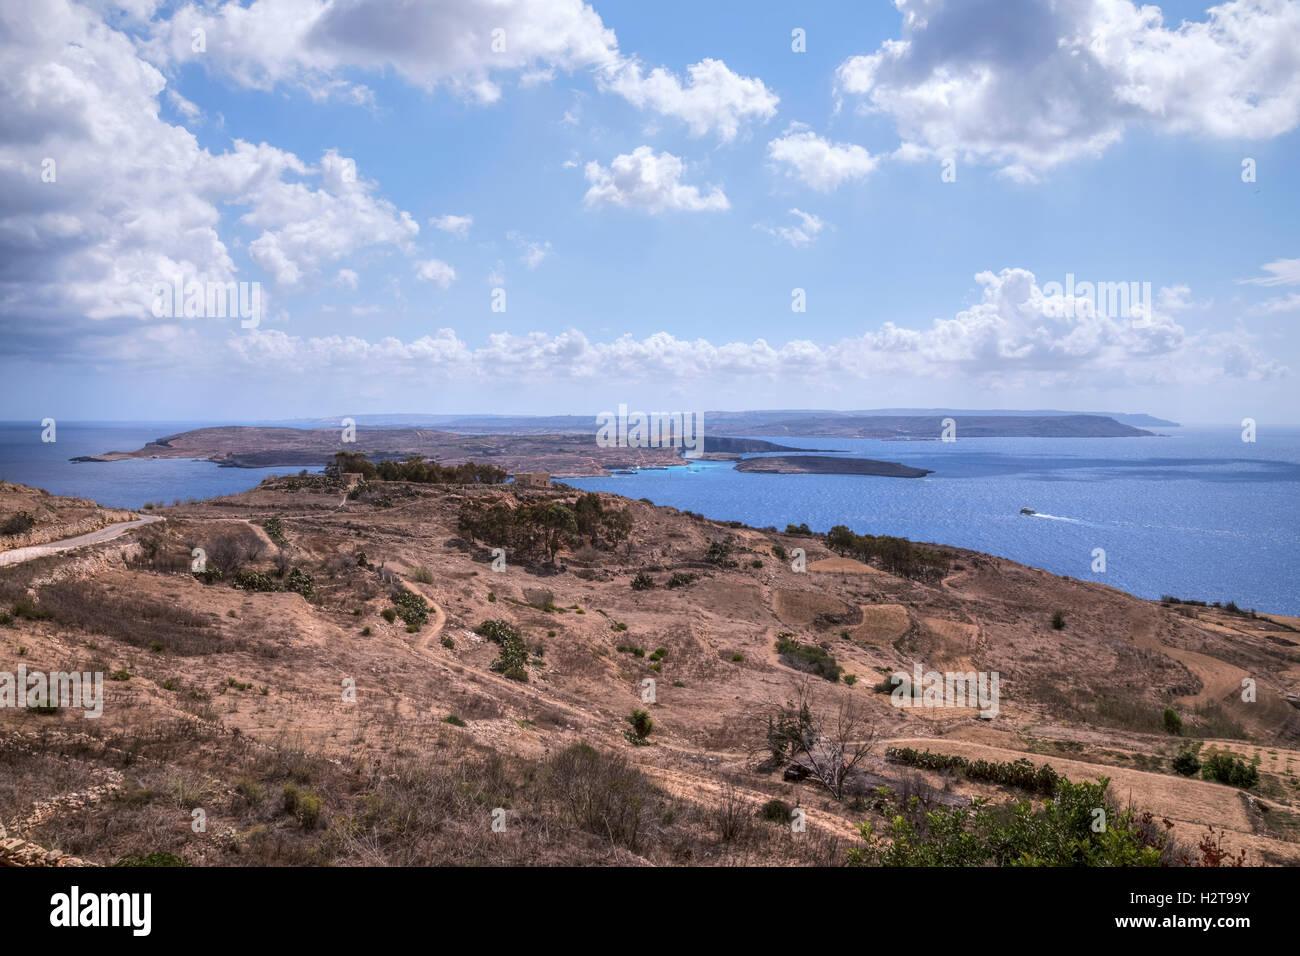 view to Comino from Qala, Gozo, Malta - Stock Image